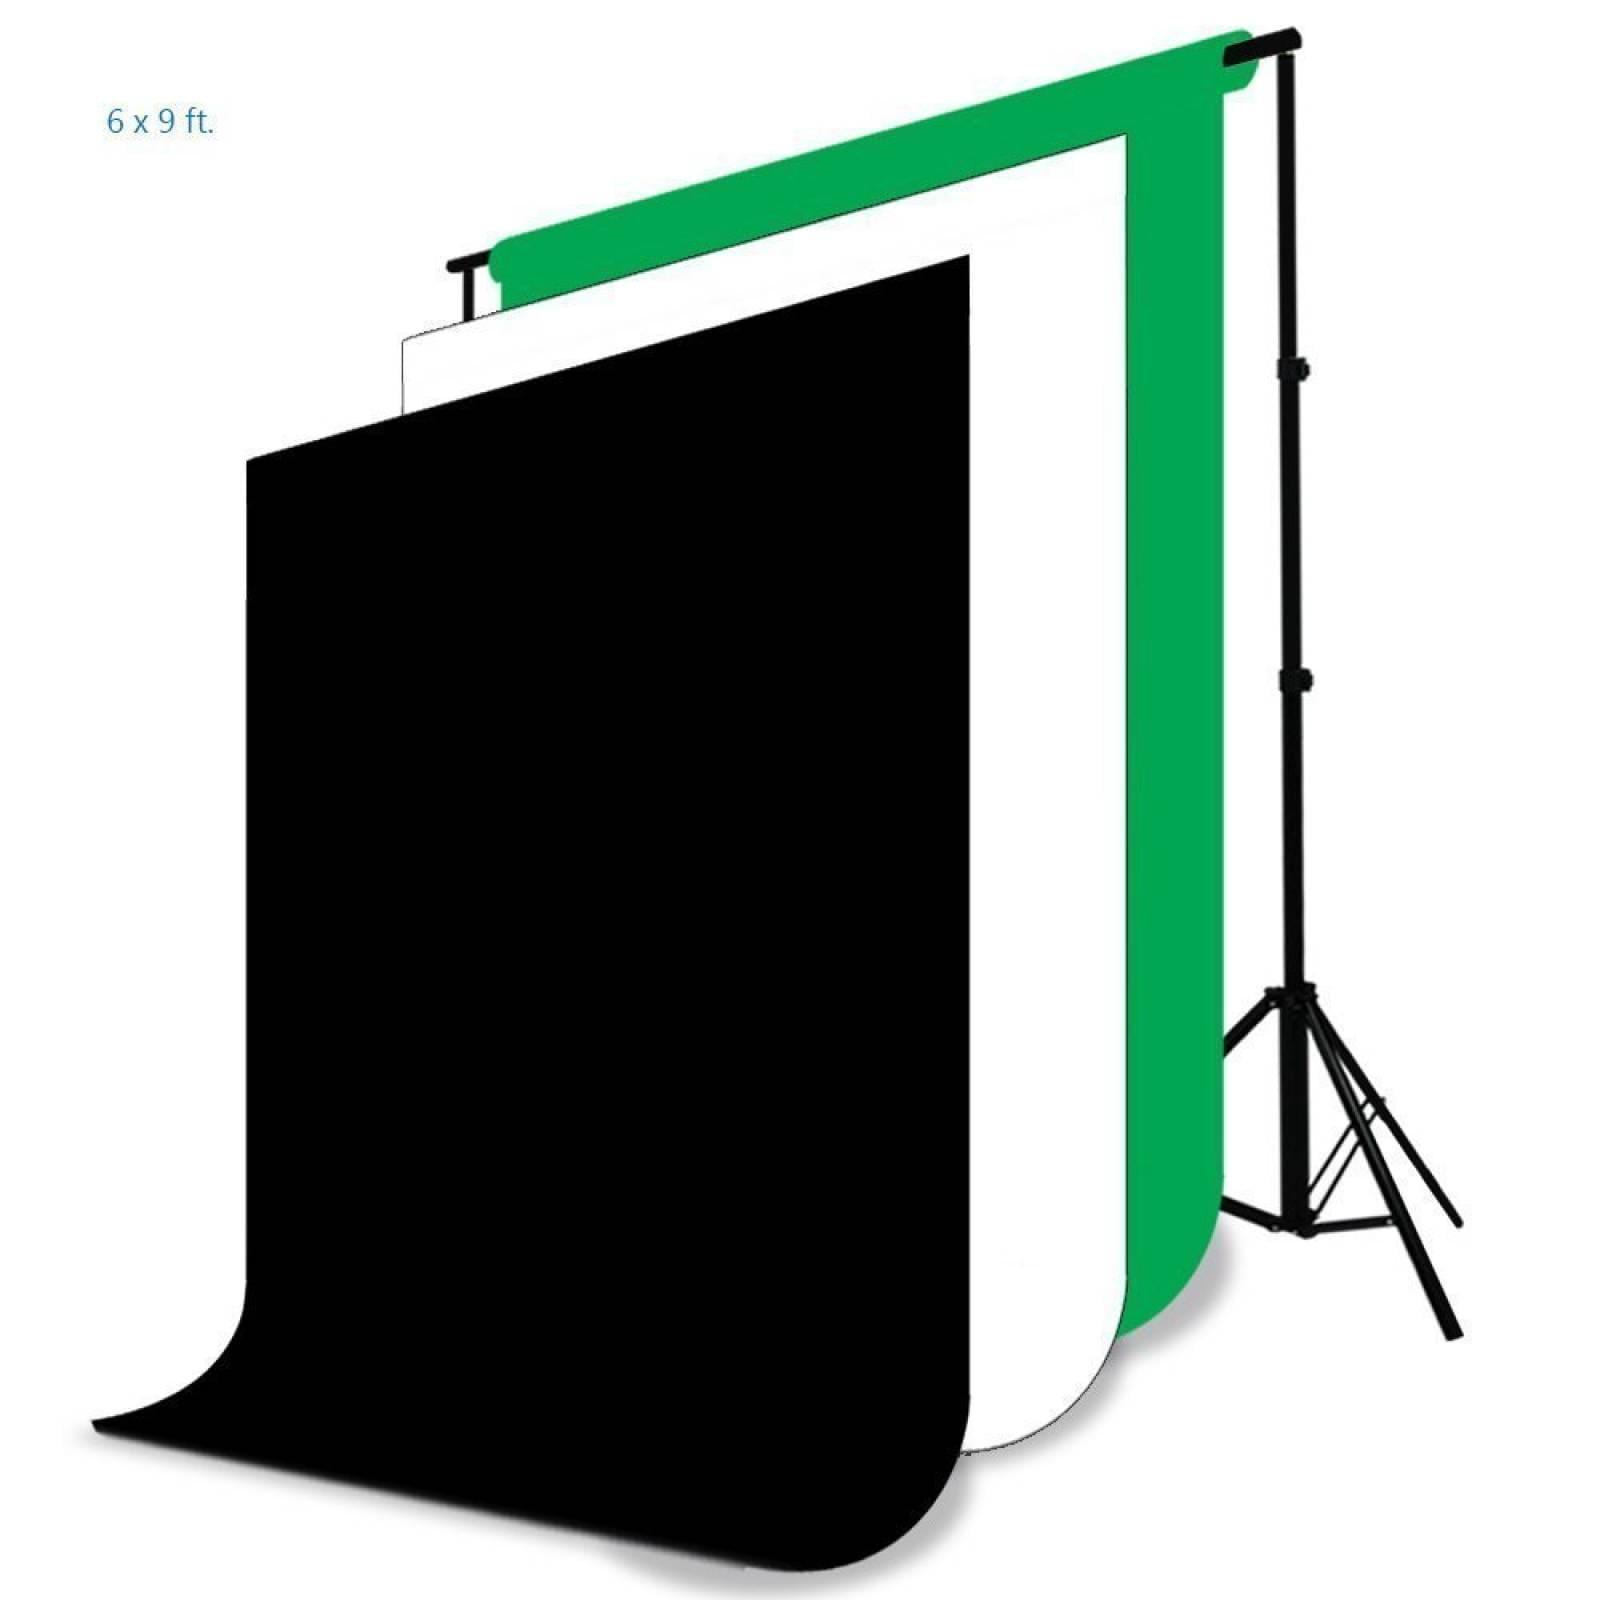 LimoStudio Foto Video Studio Kit luz - incluye Chroma -Negro